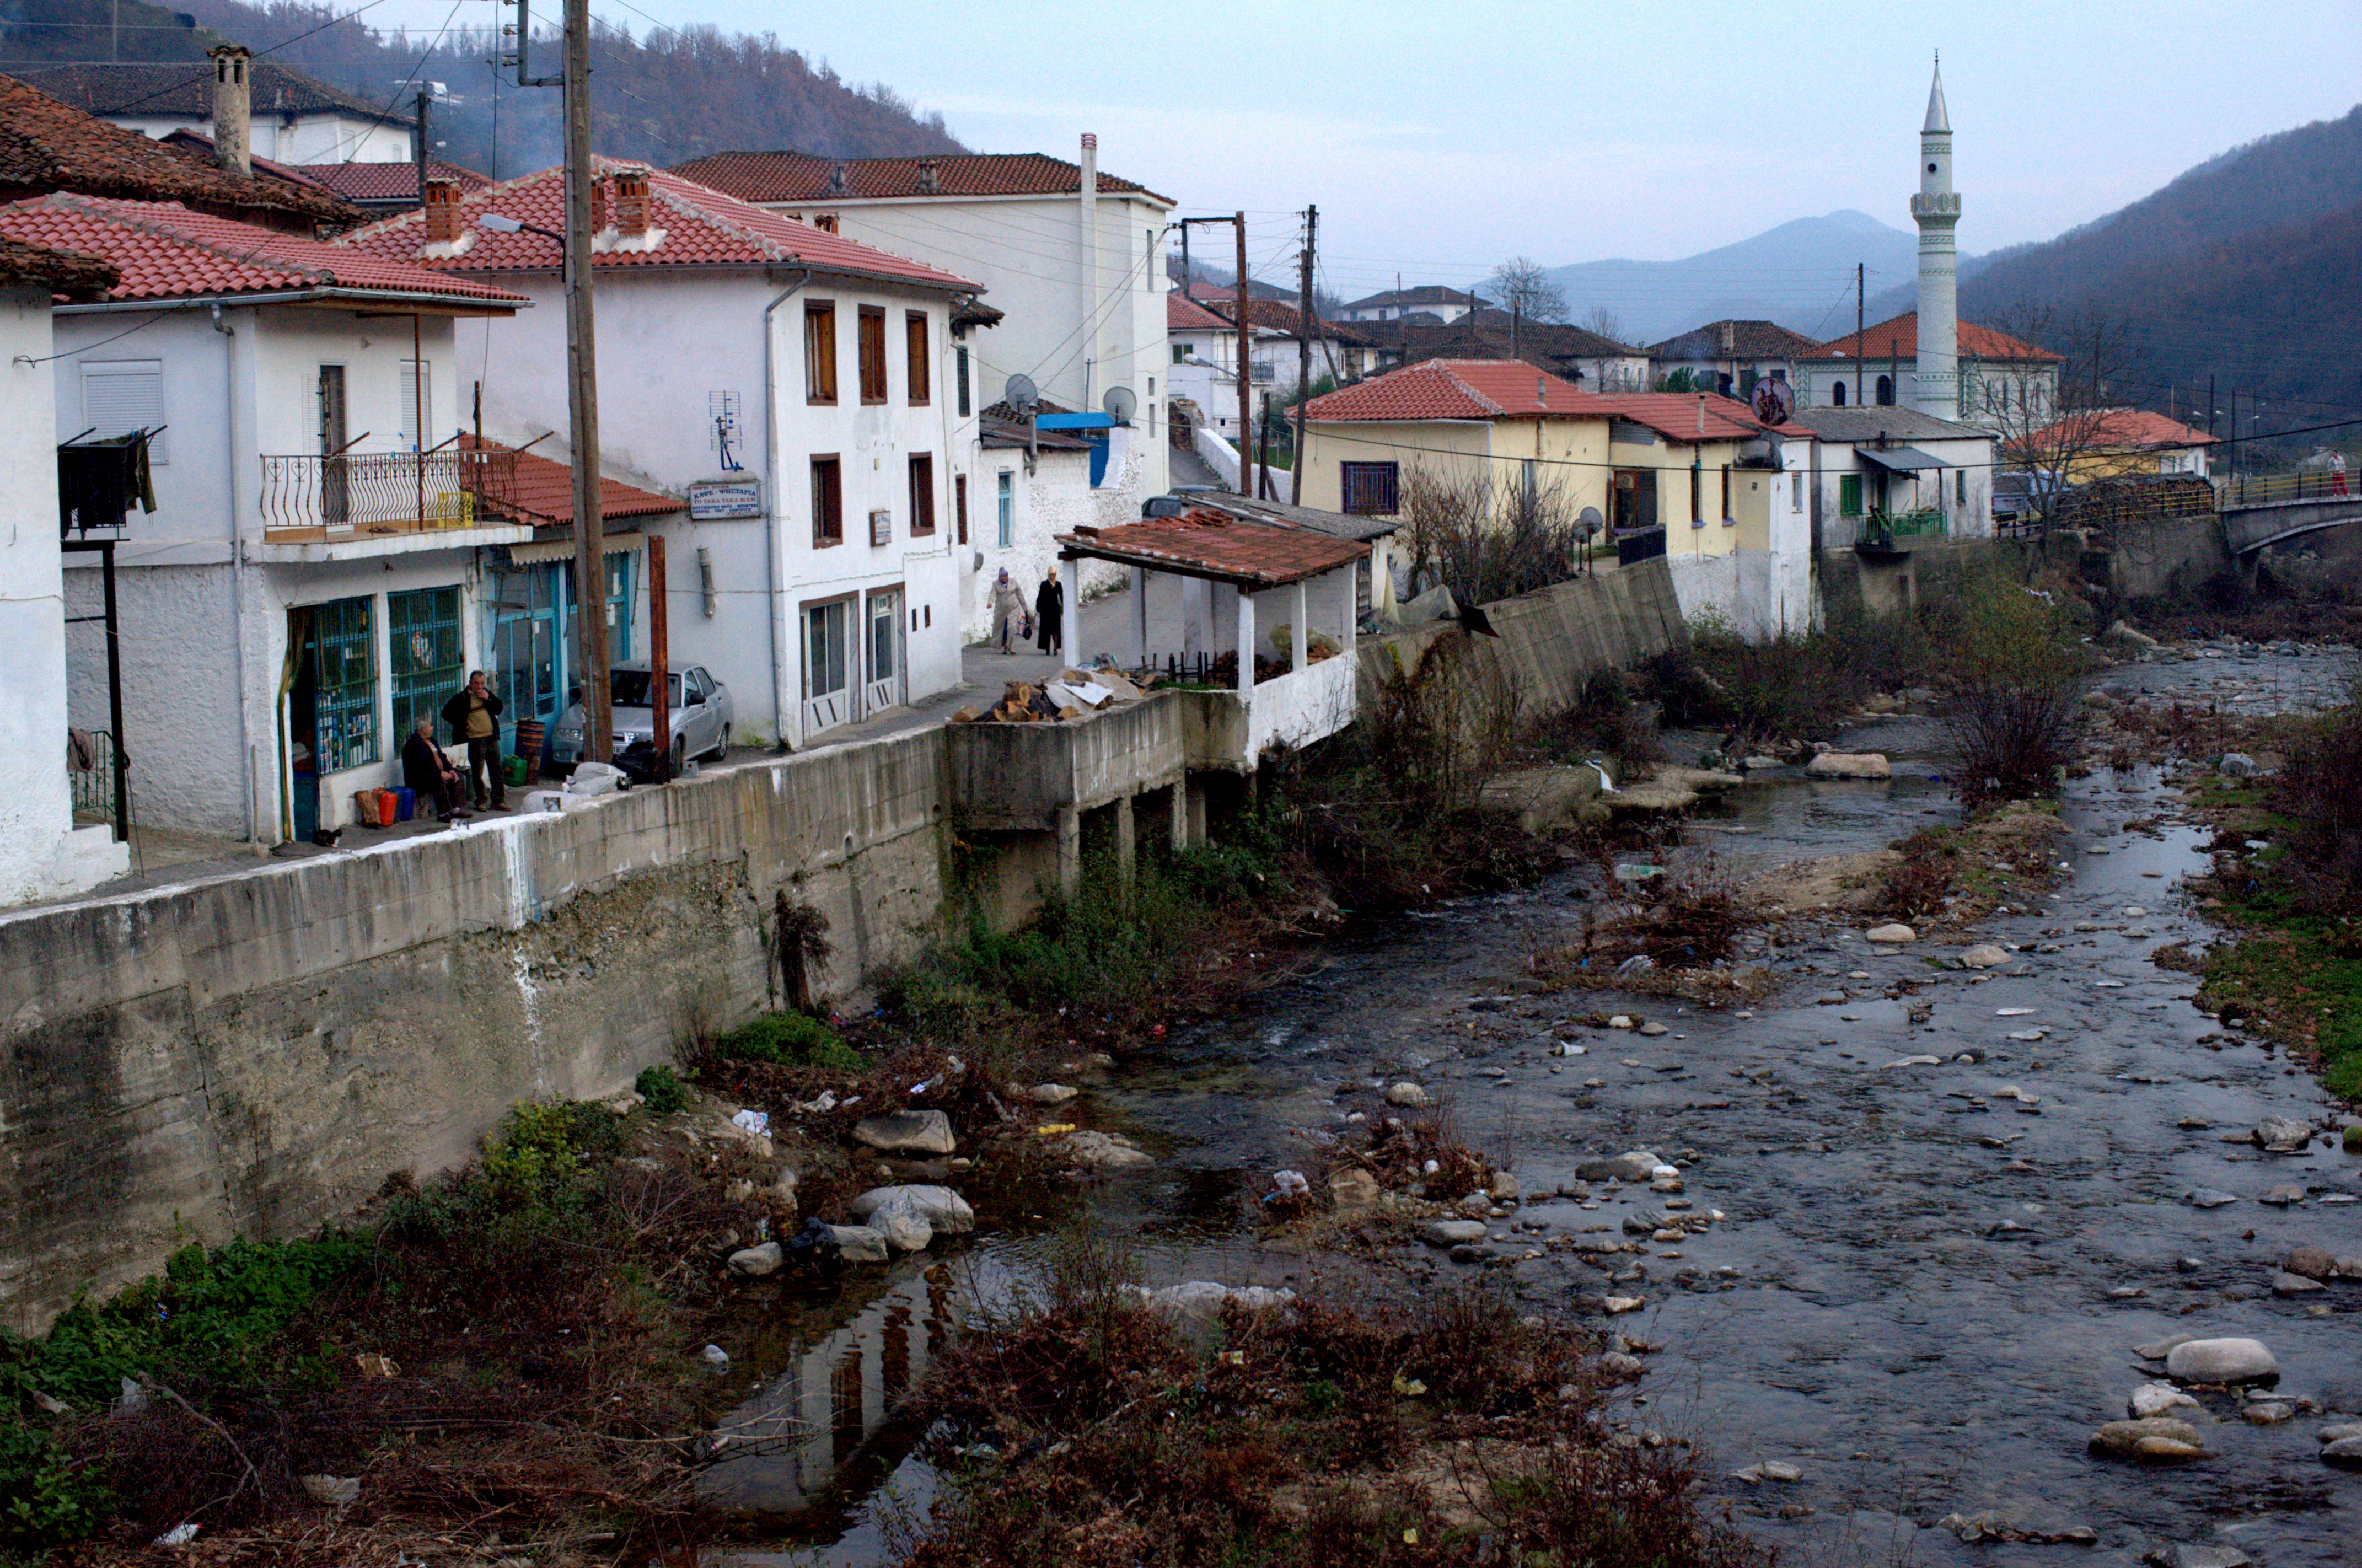 http://upload.wikimedia.org/wikipedia/commons/0/04/20091128_Medusa_Xanthi_Thrace_Greece_2.jpg